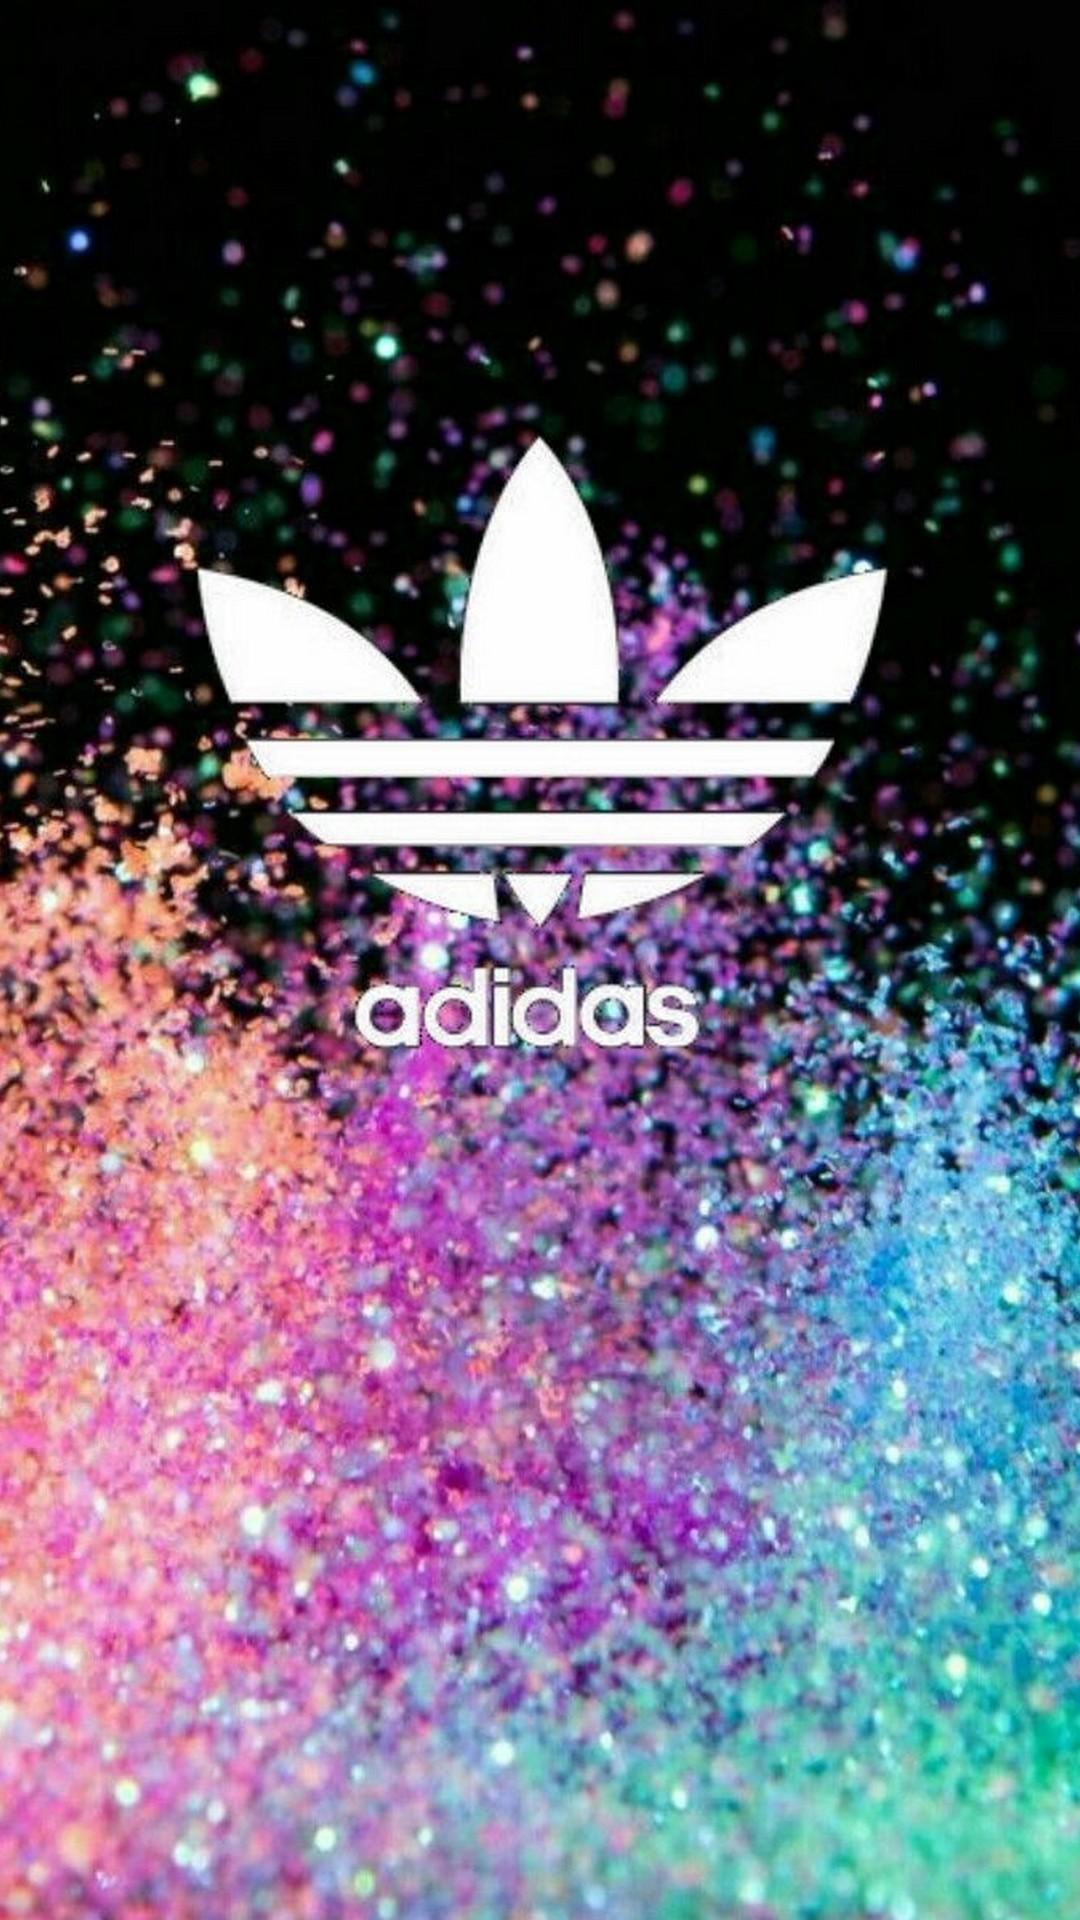 Adidas Iphone Wallpaper Design 2020 Cute Iphone Wallpaper